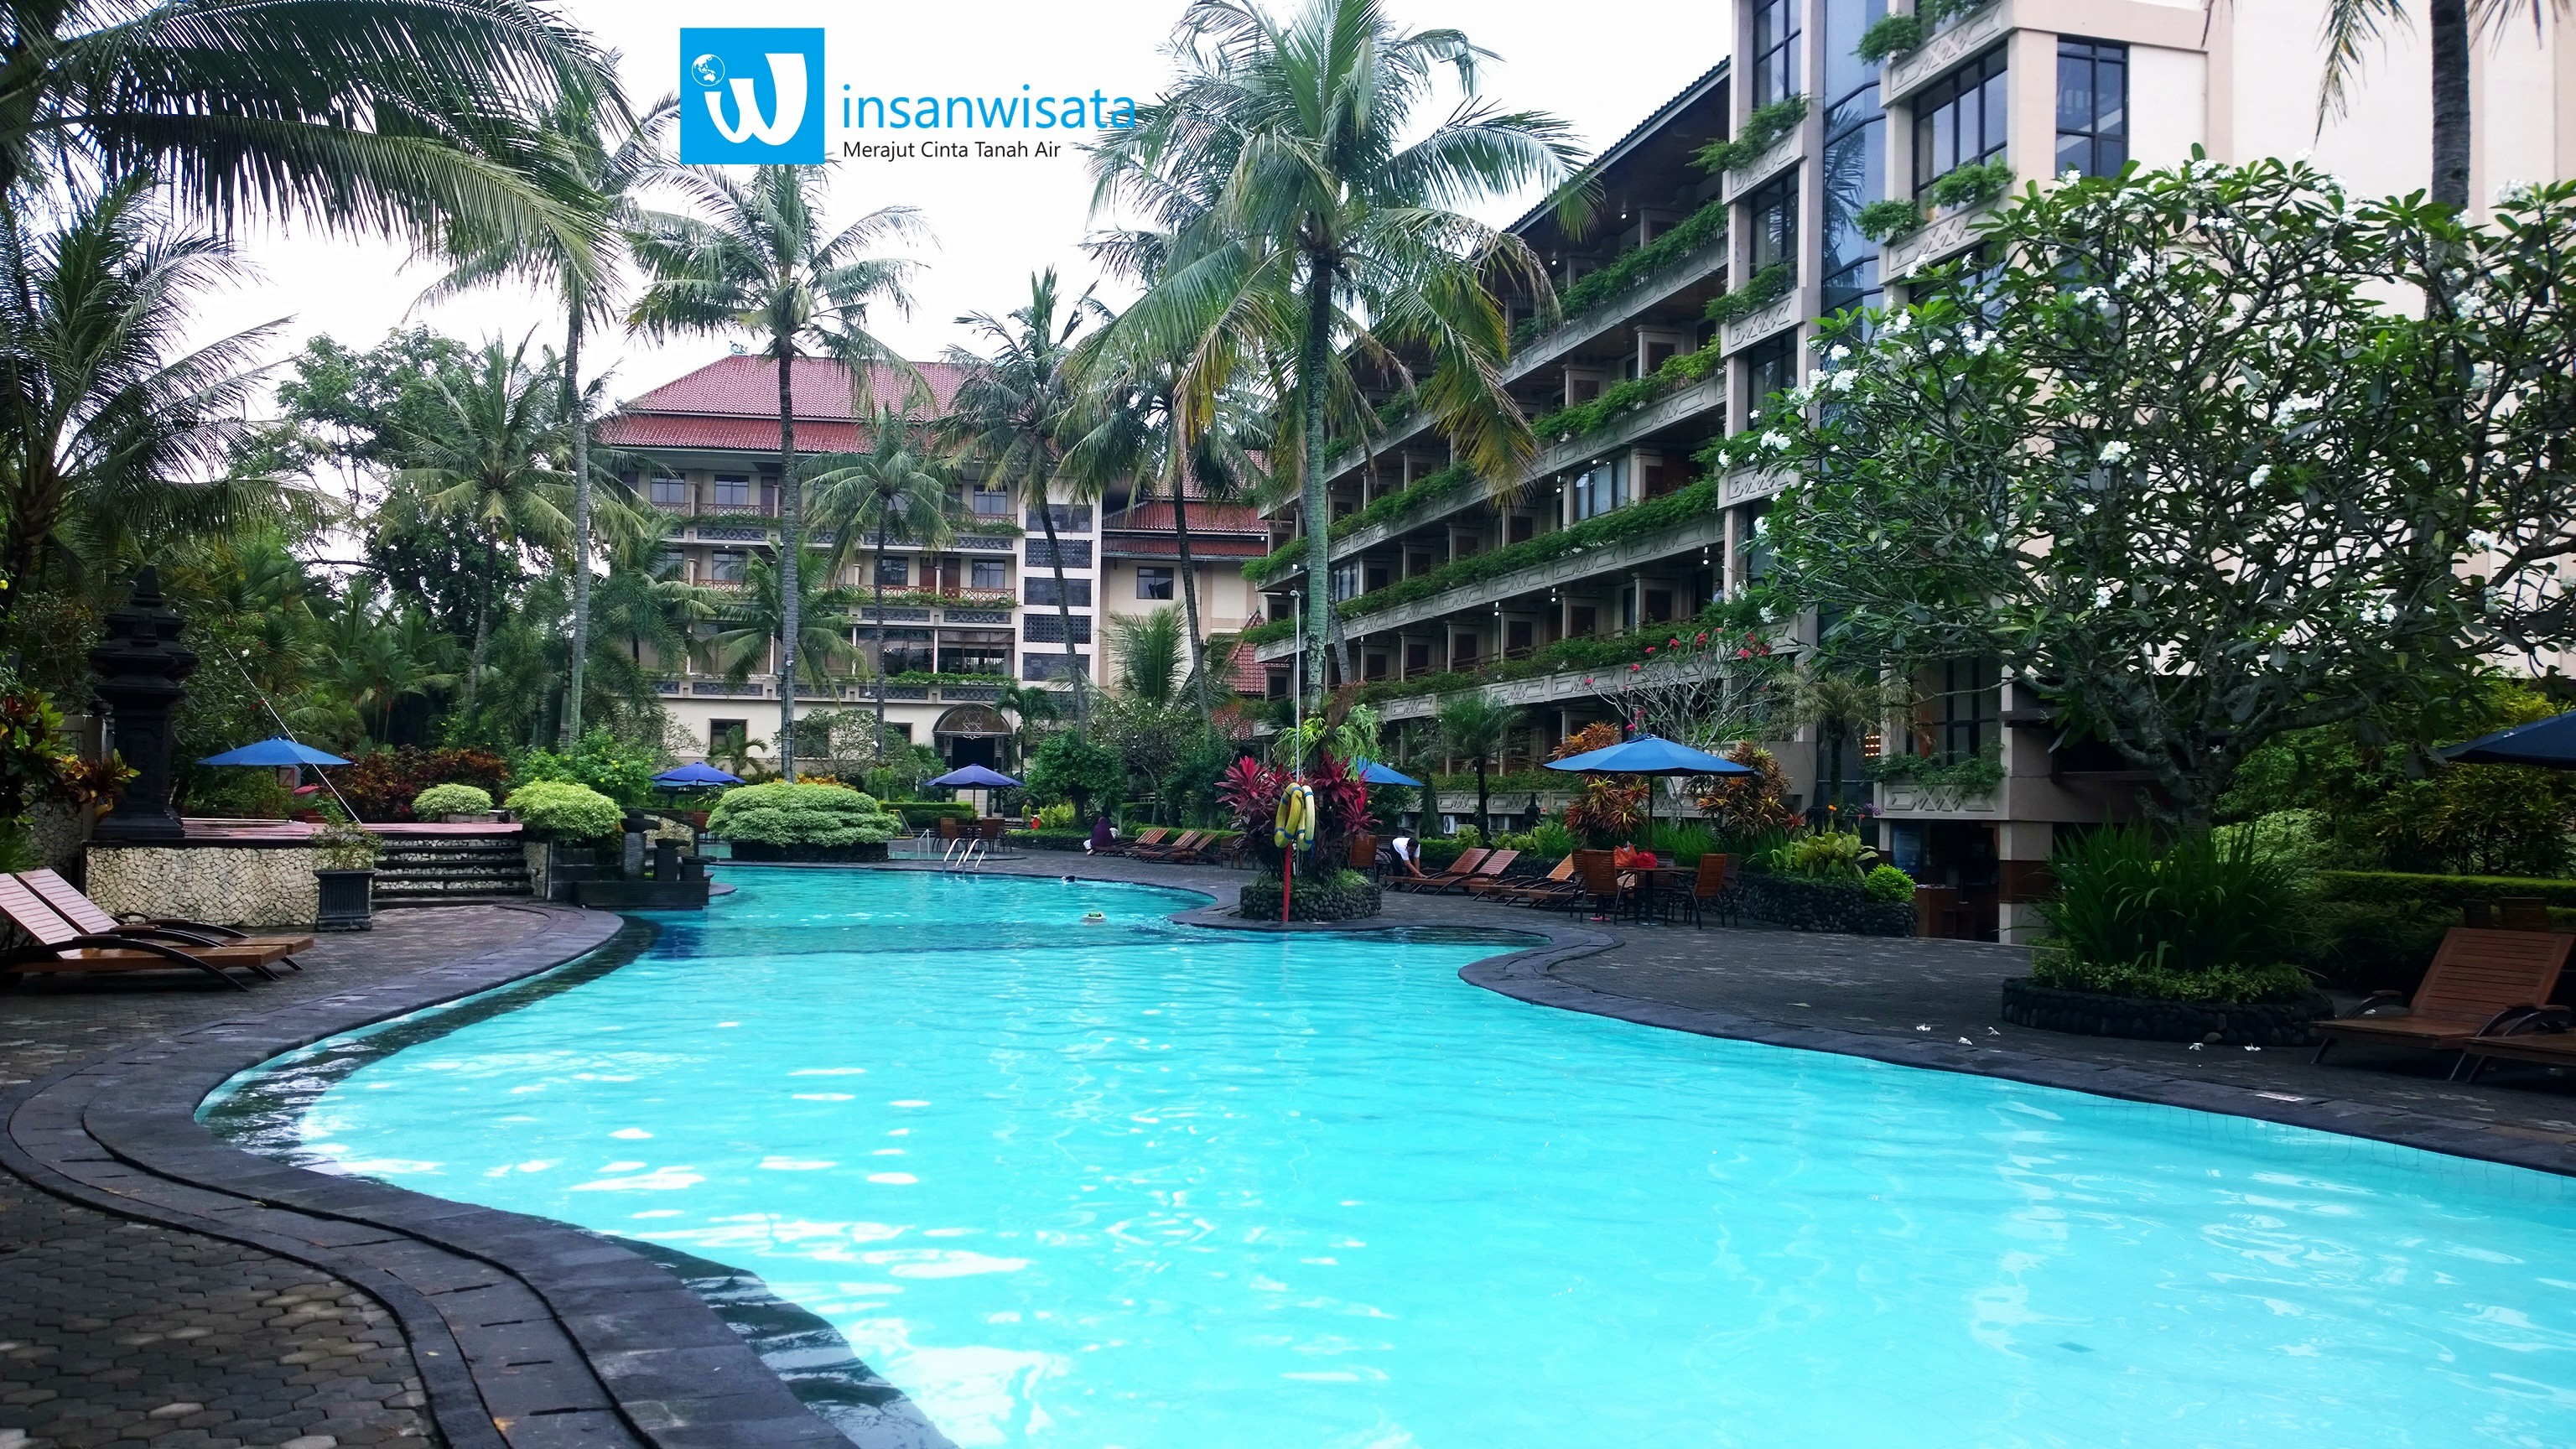 review the jayakarta yogyakarta hotel and spa rh insanwisata com tarif hotel jayakarta jogja harga kamar hotel jayakarta yogyakarta